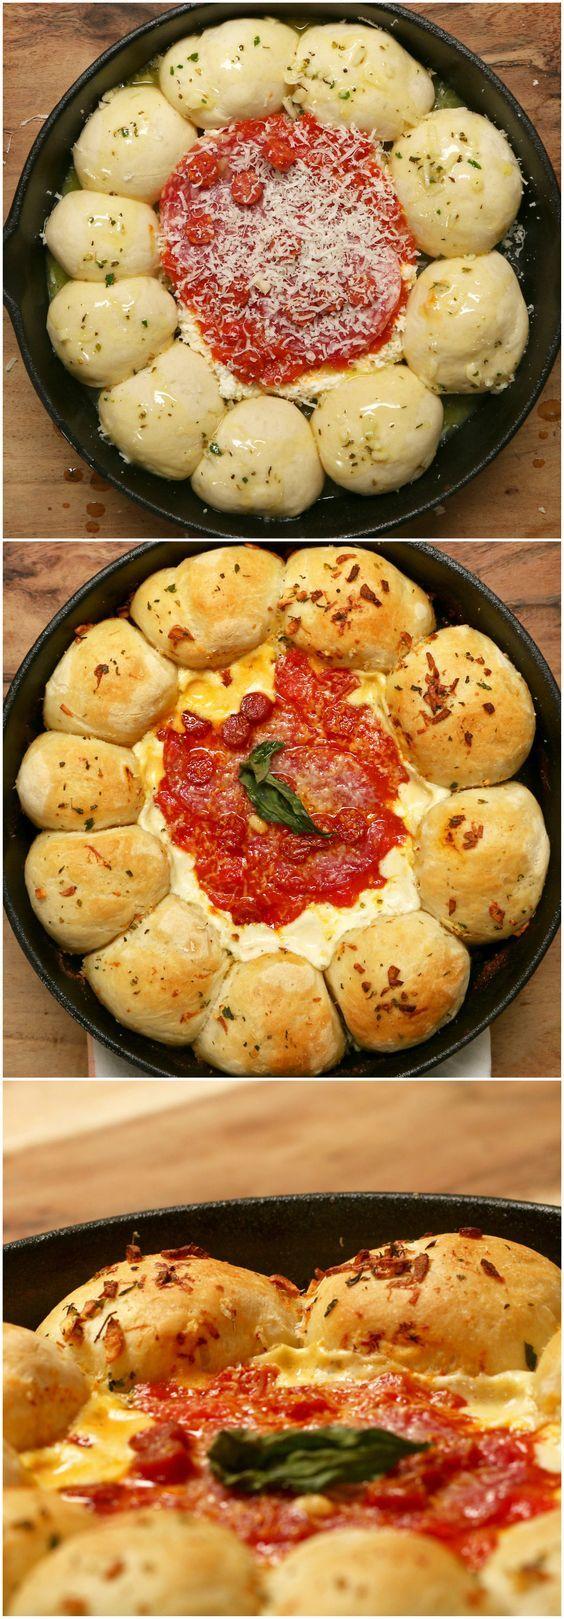 Pizza Dip With Dough Balls: